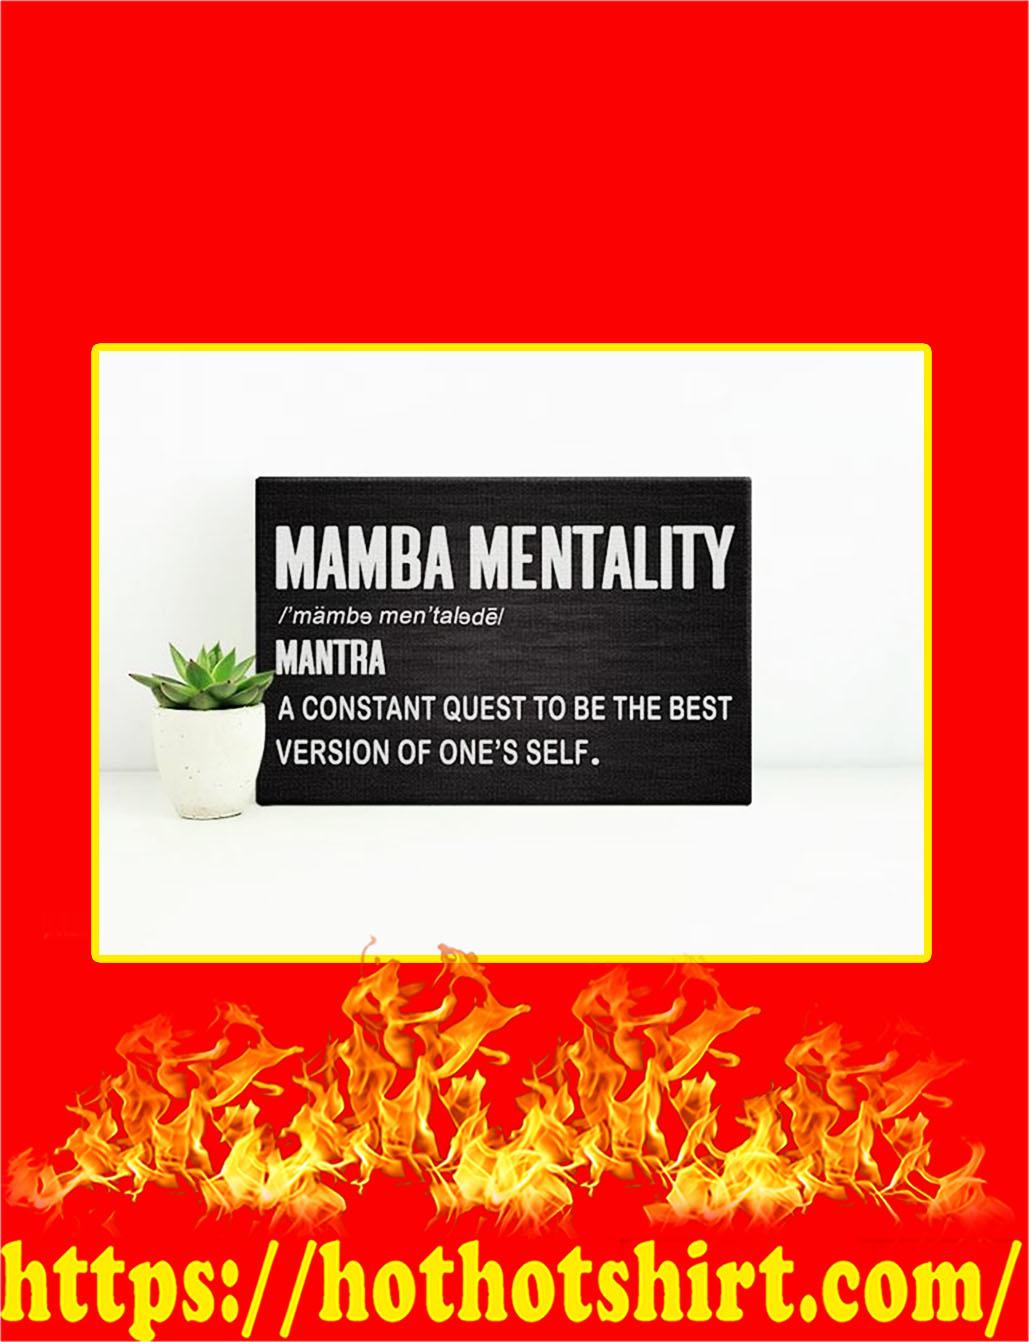 Mamba Mentality Canvas Prints - Medium